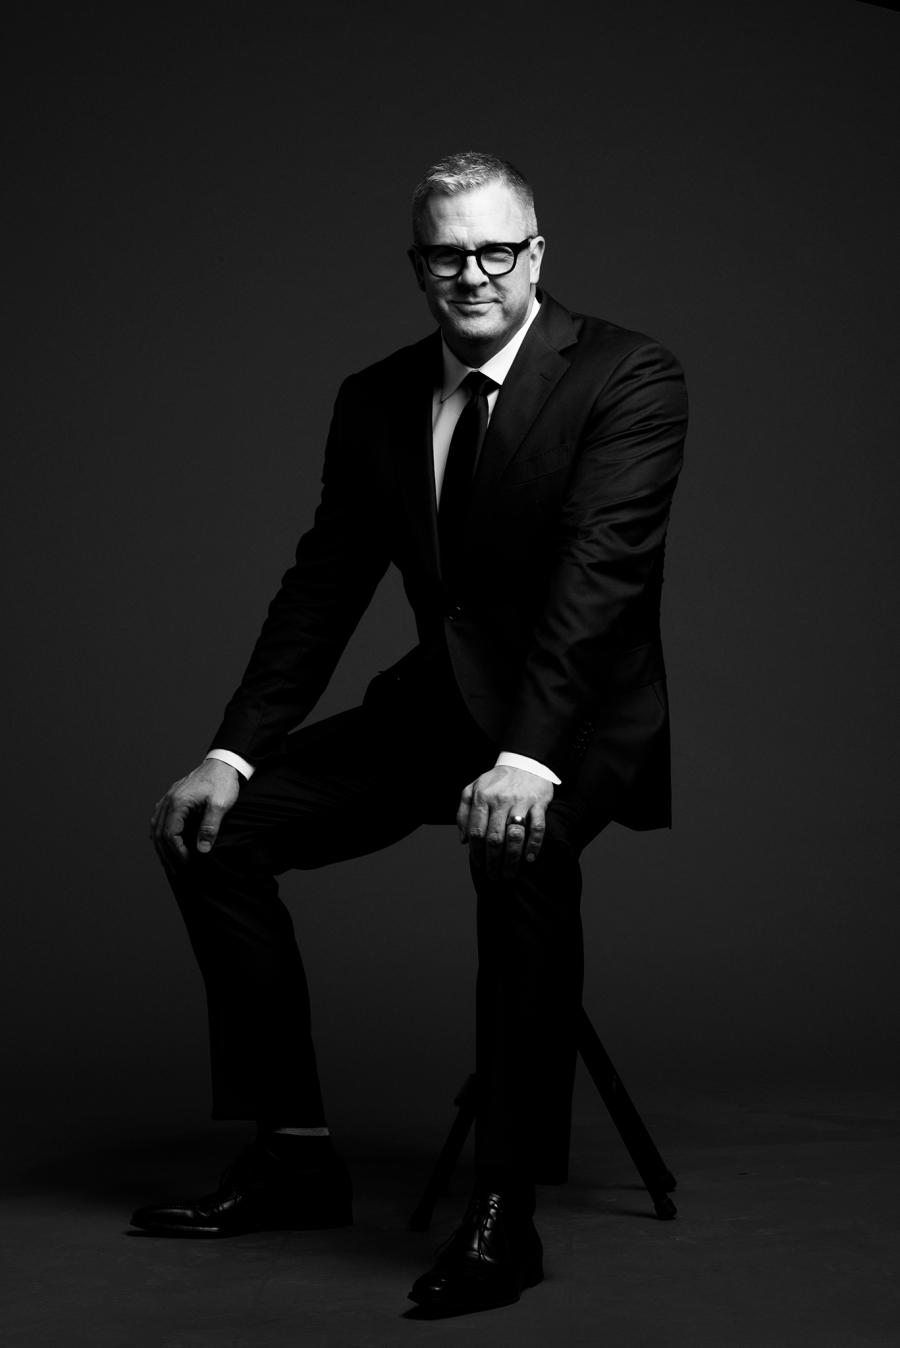 Gary Jackson's New Image 2015